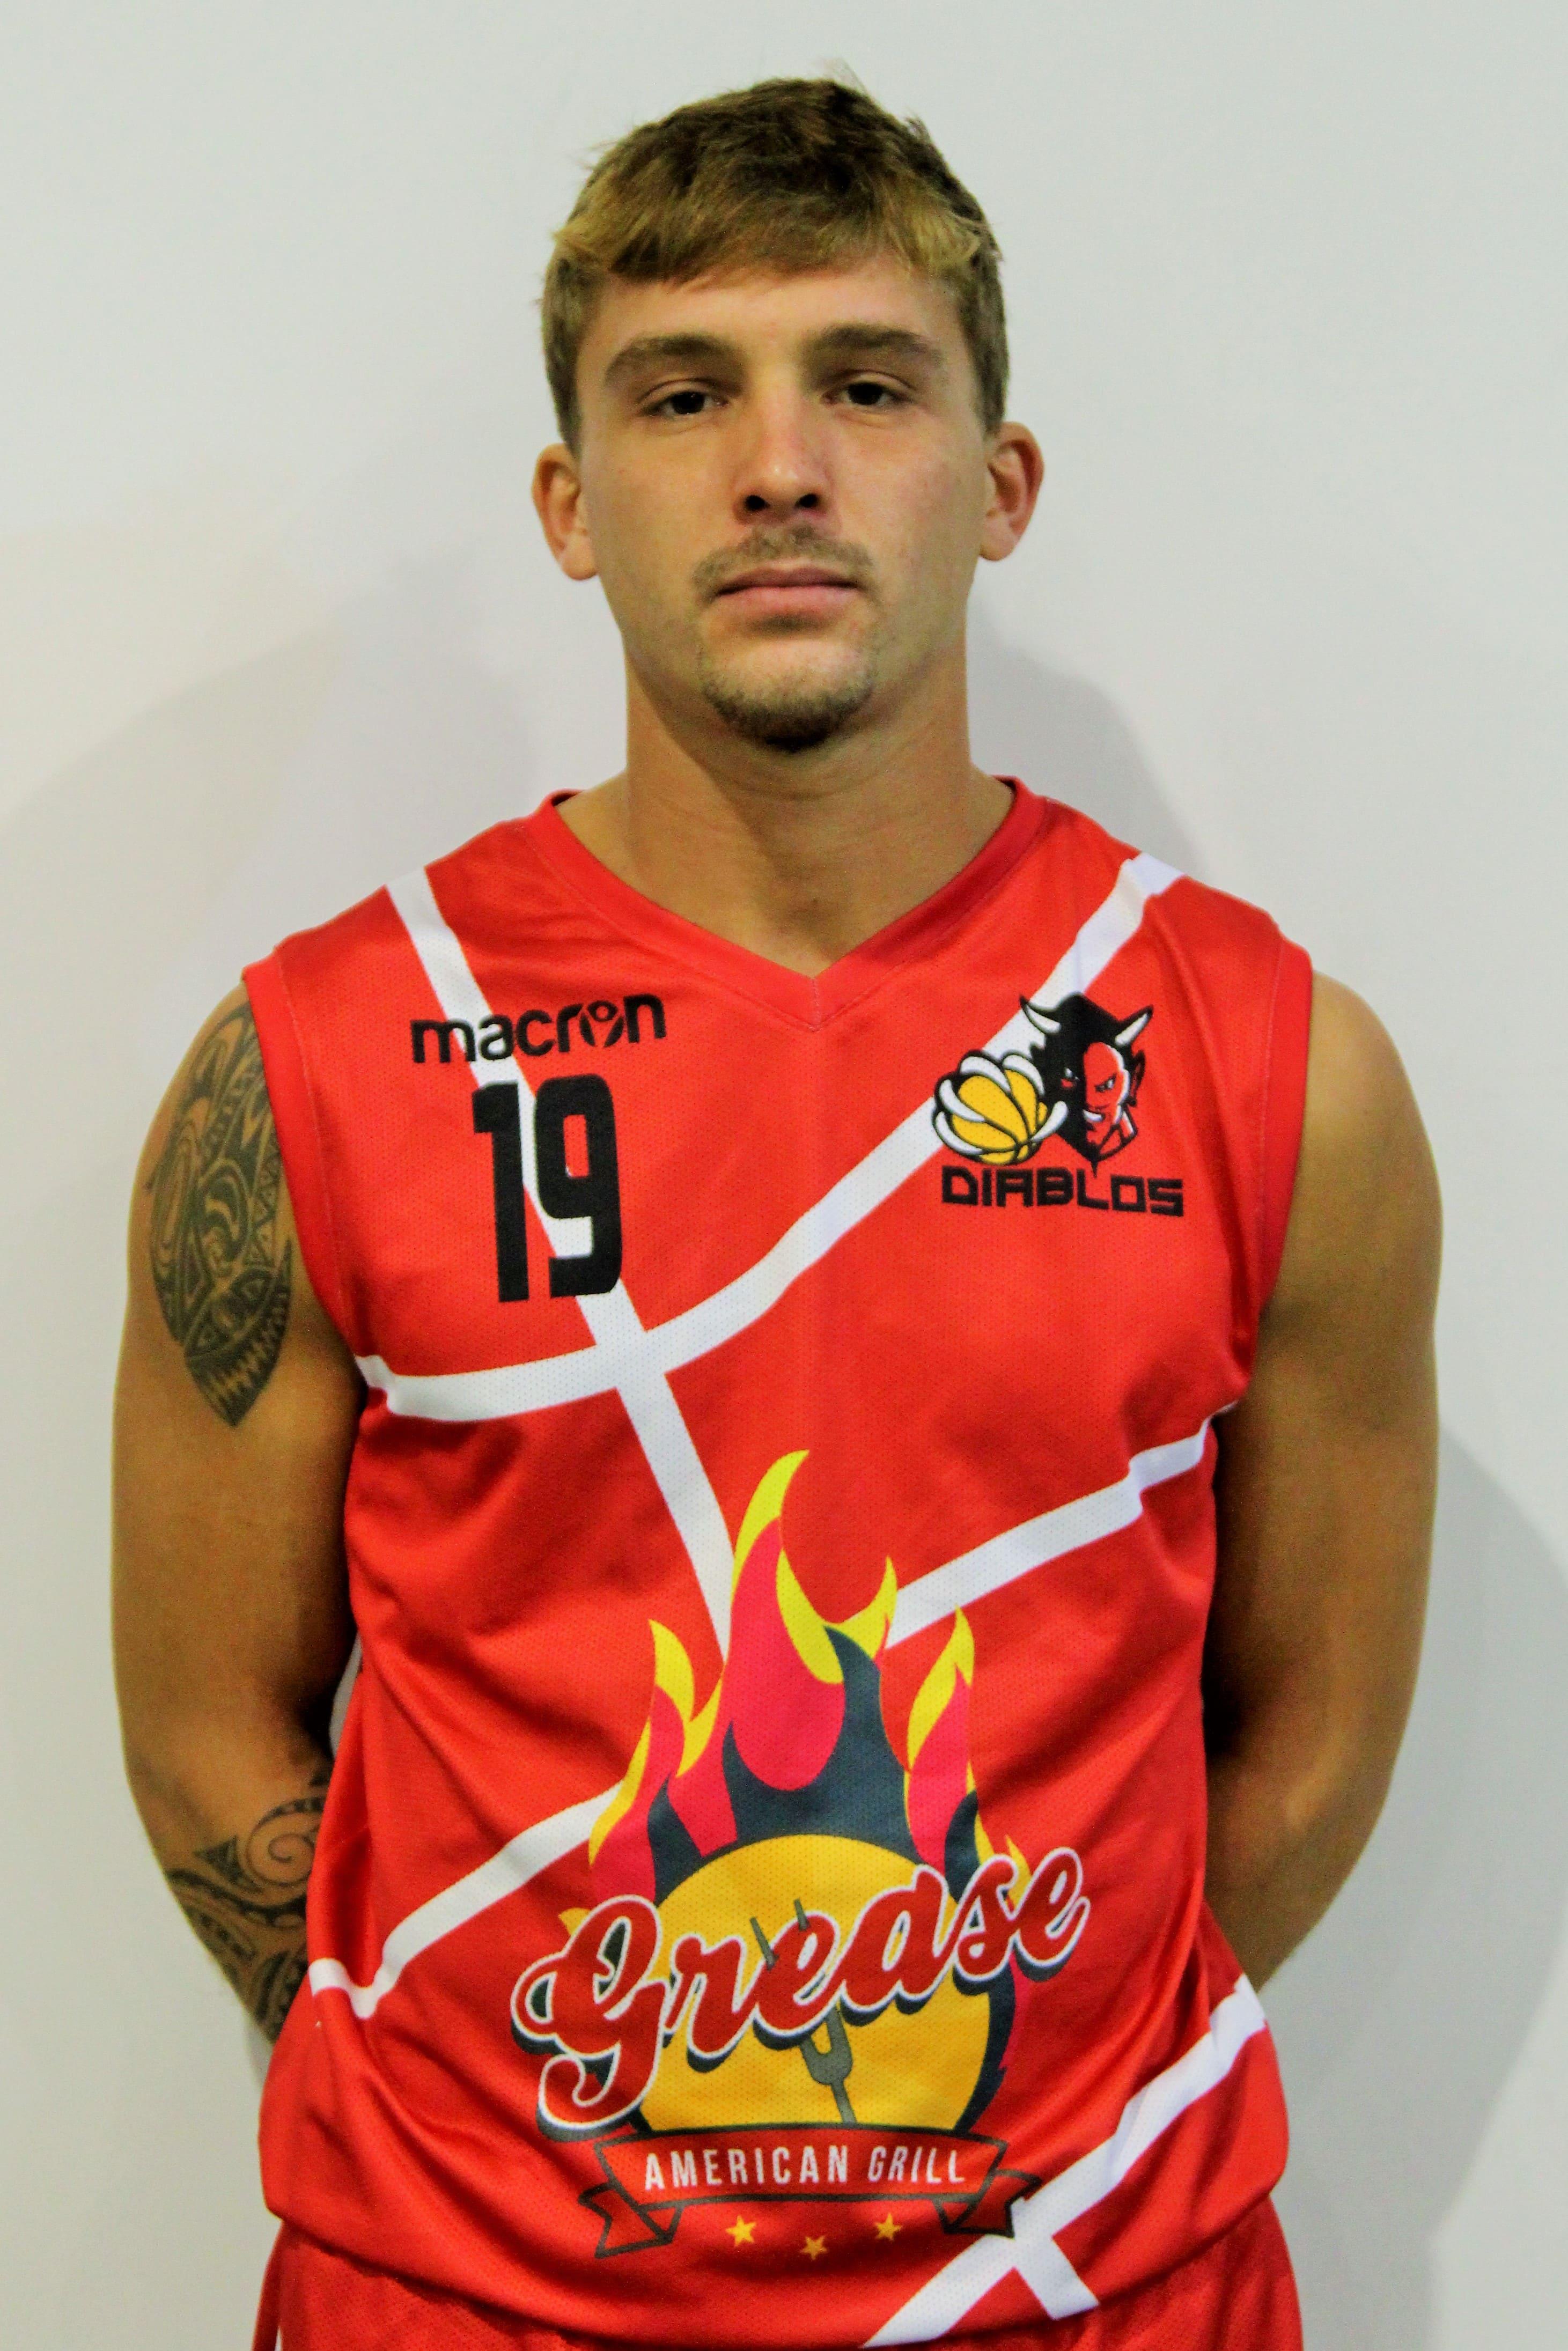 Edoardo Vannini